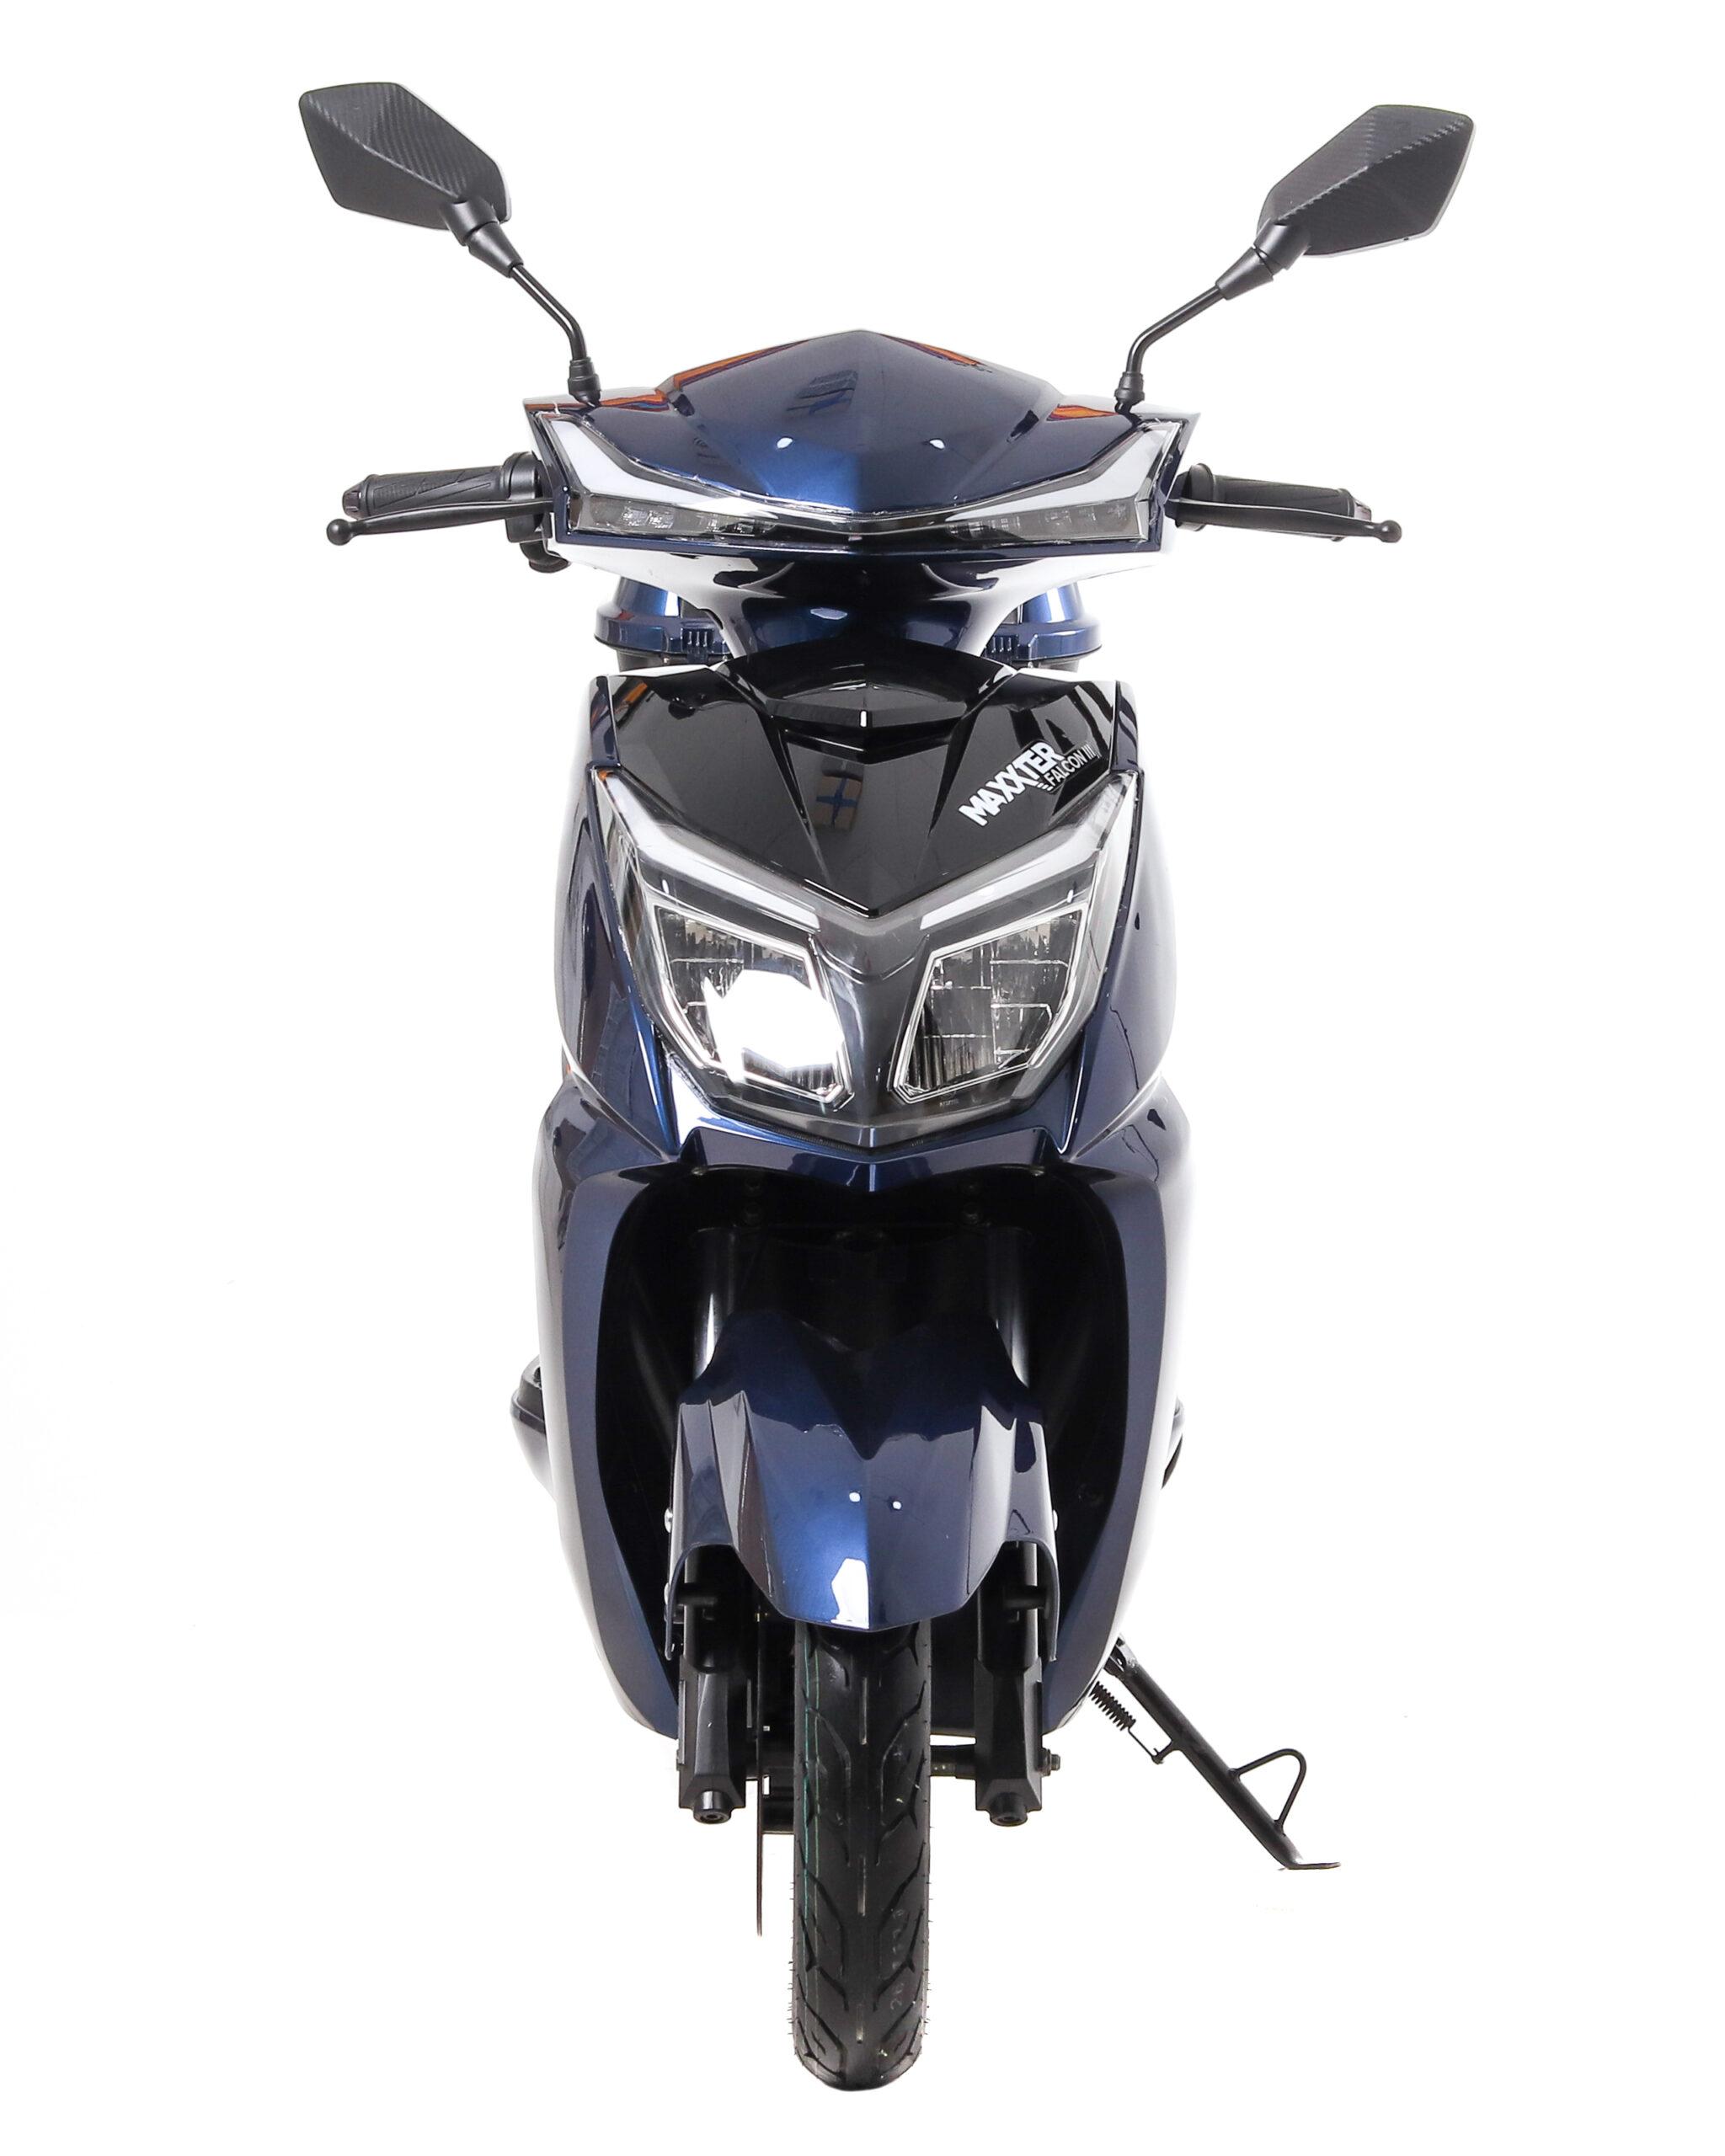 ЭЛЕКТРОСКУТЕР MAXXTER FALCON III  Артмото - купить квадроцикл в украине и харькове, мотоцикл, снегоход, скутер, мопед, электромобиль